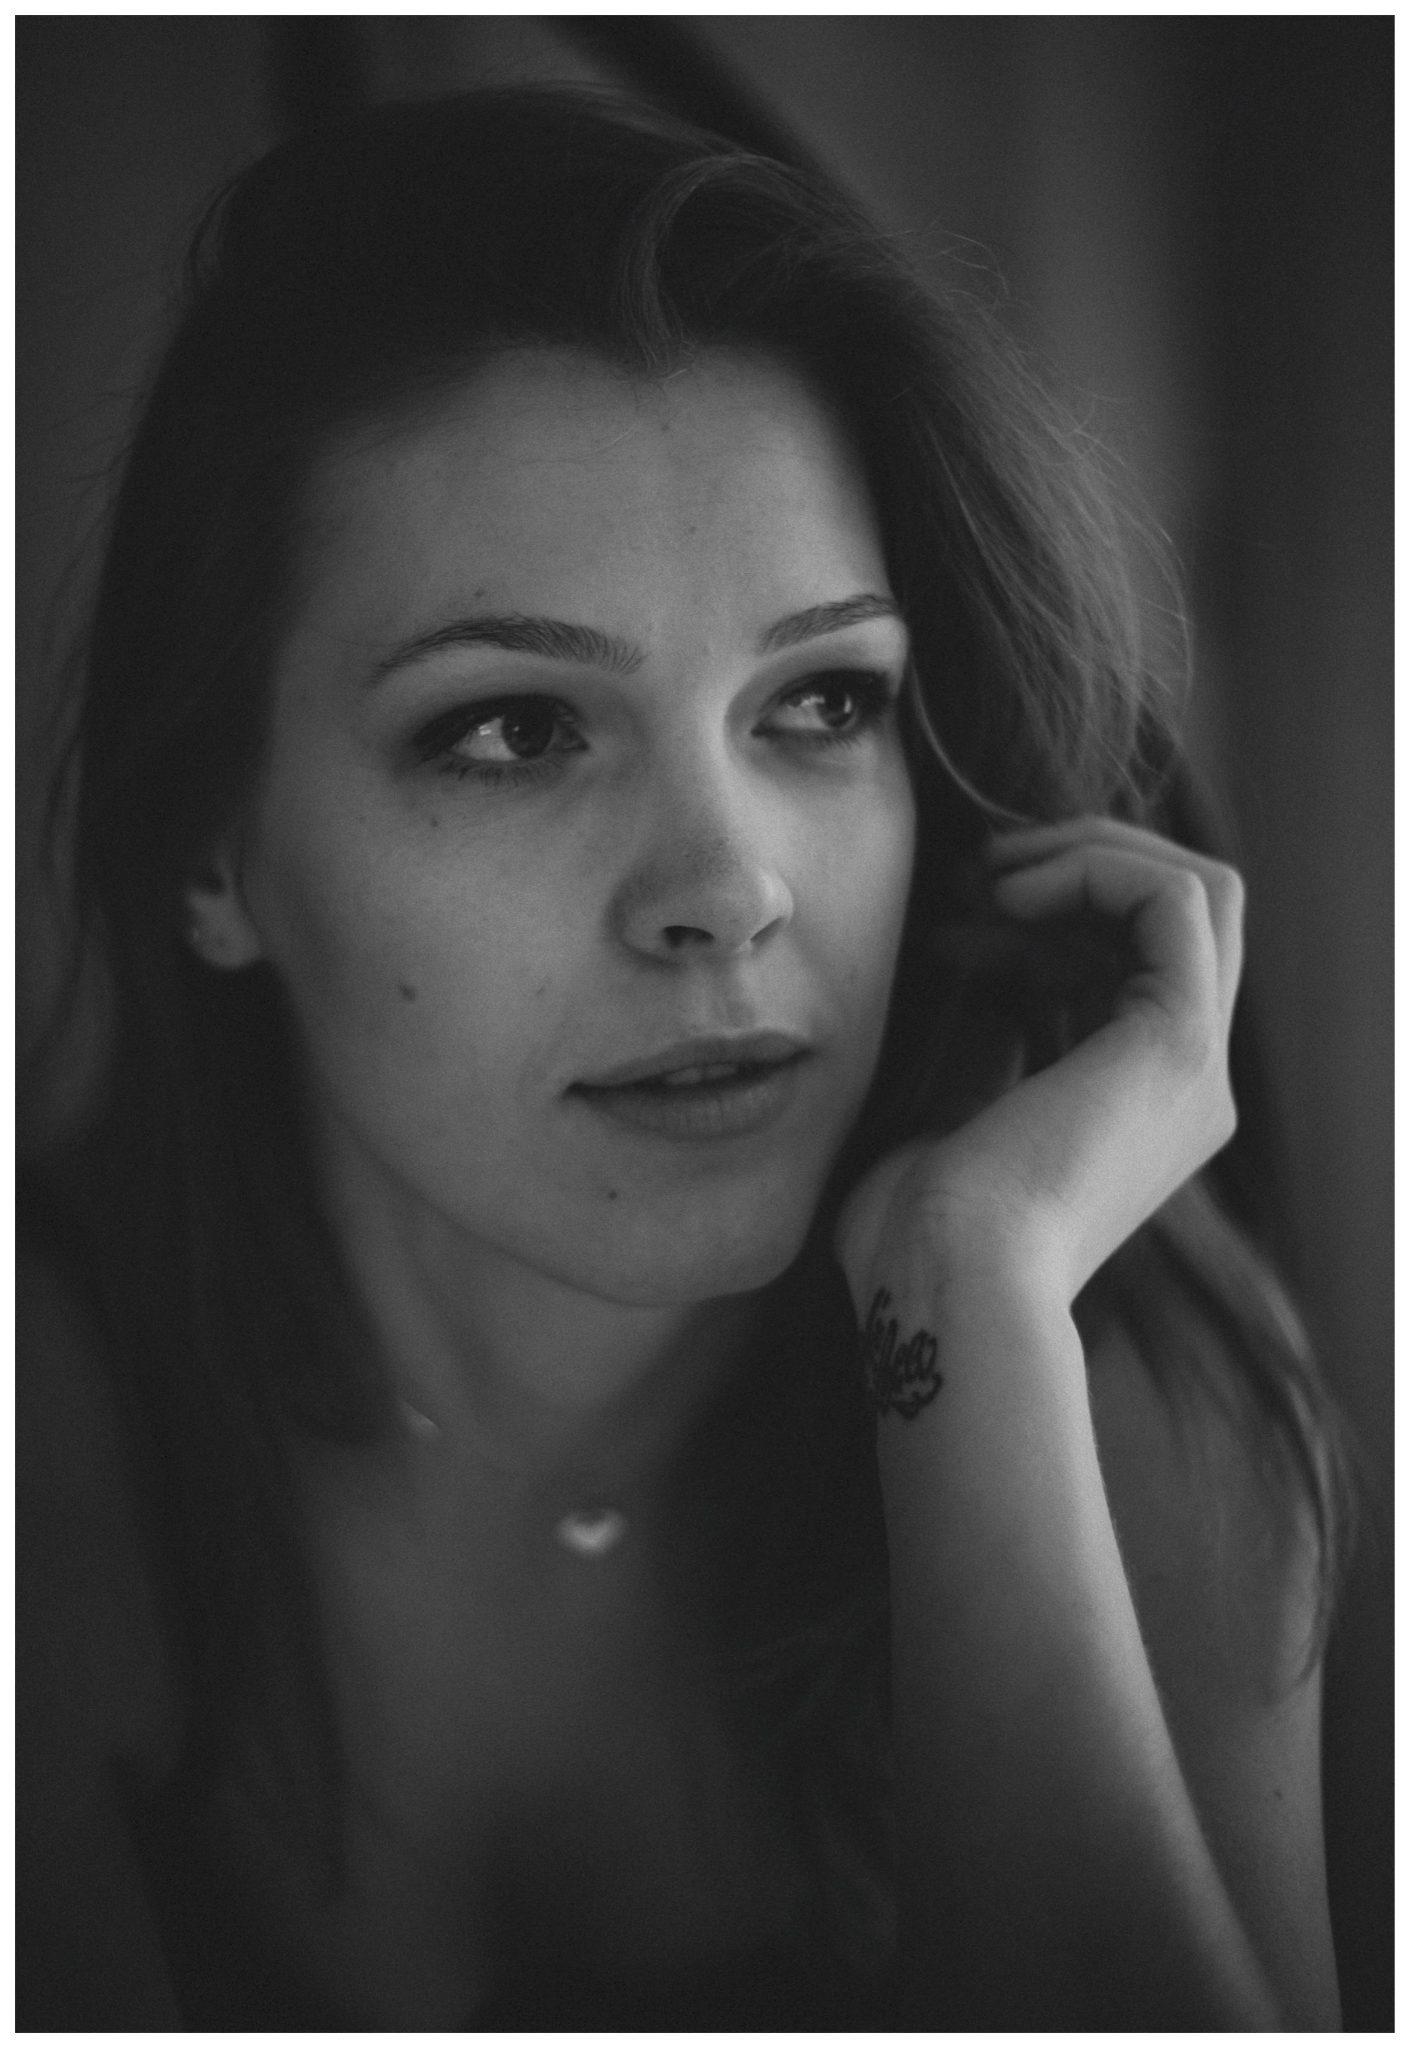 aga6 <h2>Sesja buduarowa   Agnieszka</h2>